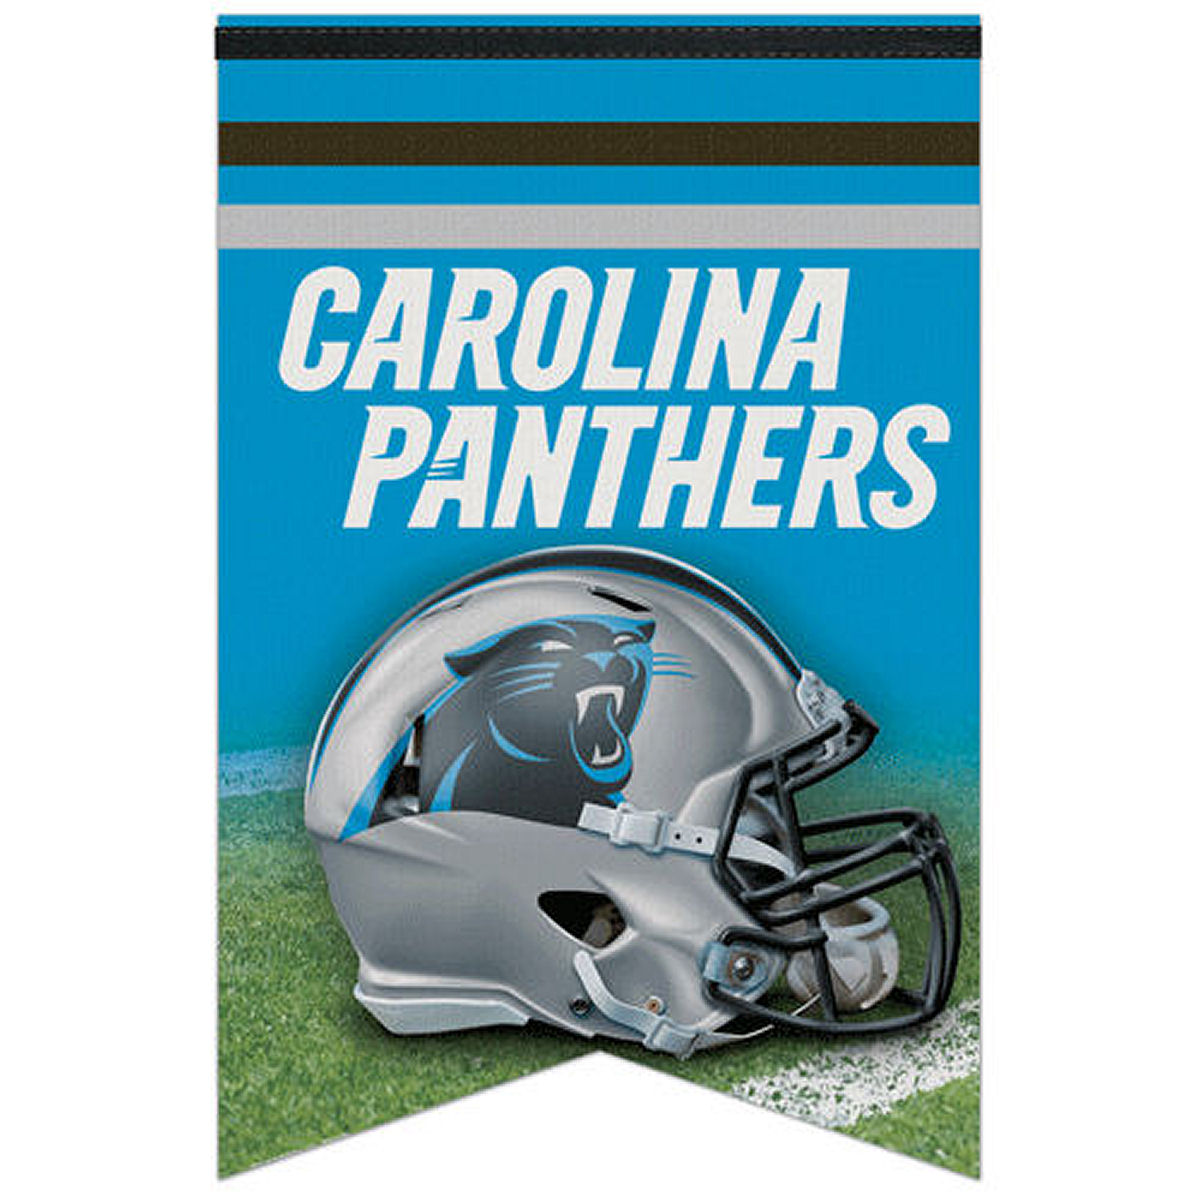 "Carolina Panthers 17"" x 26"" Banner"